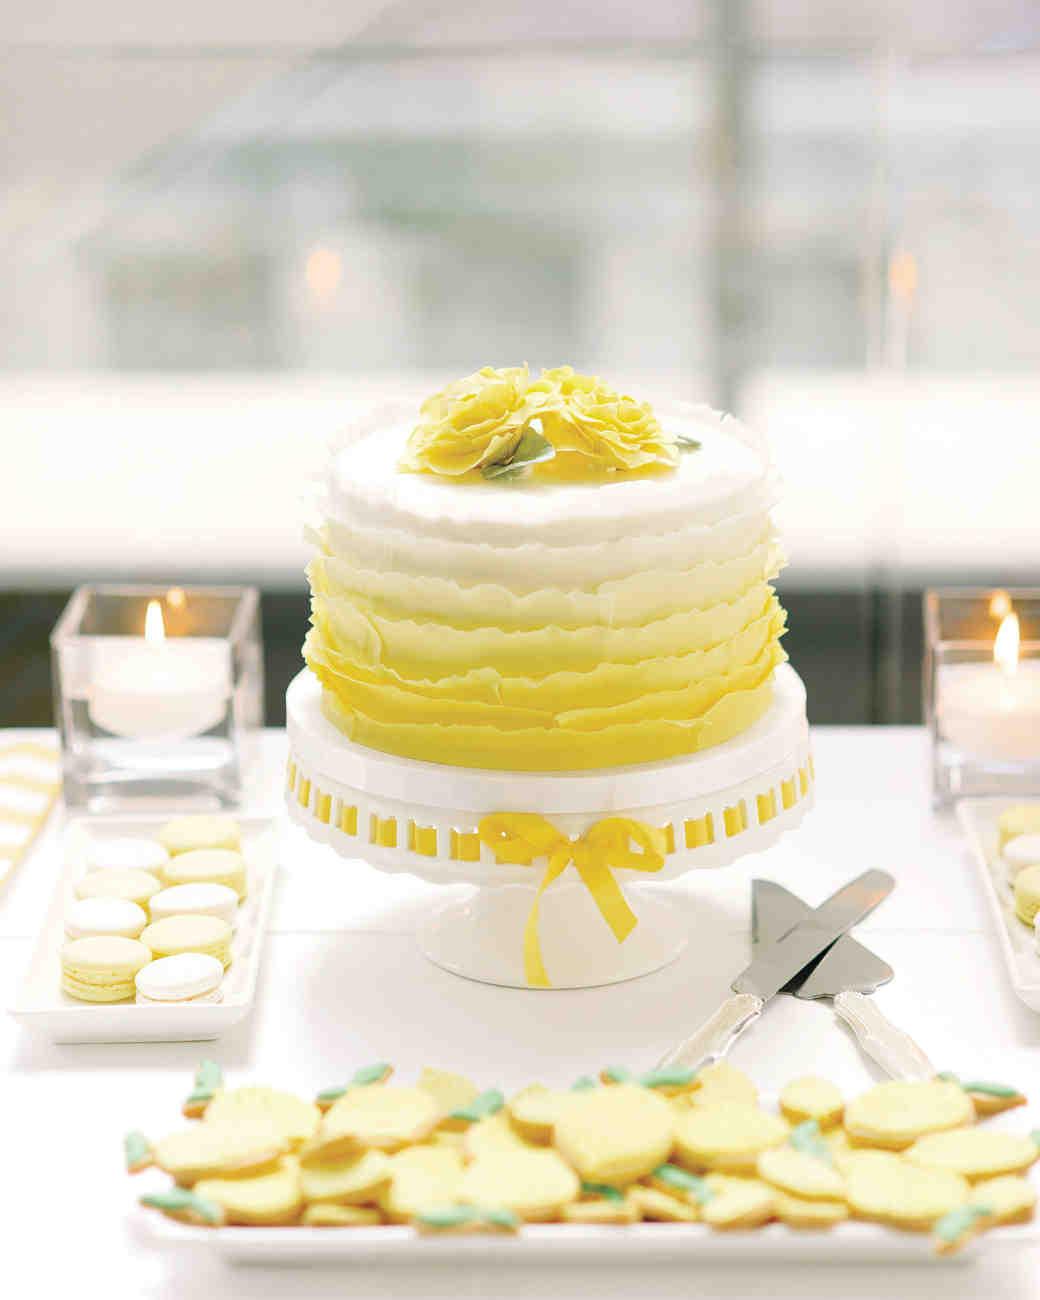 Old Fashioned Wedding Cakes Donegal Embellishment - Wedding Idea ...